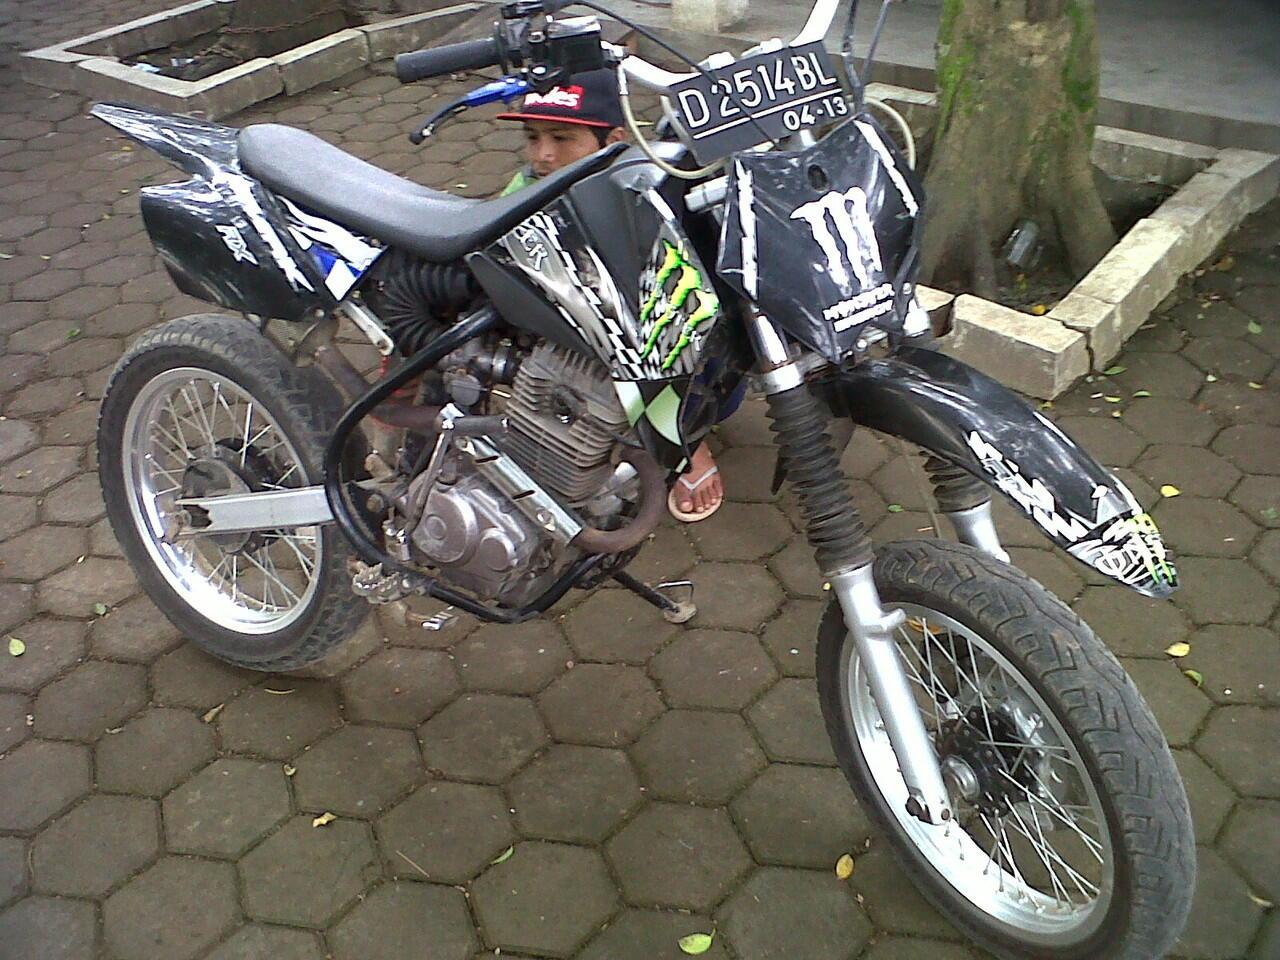 Terjual MOTOR TRAIL MODIF GL PRO NEOTECH96 Bandung KASKUS